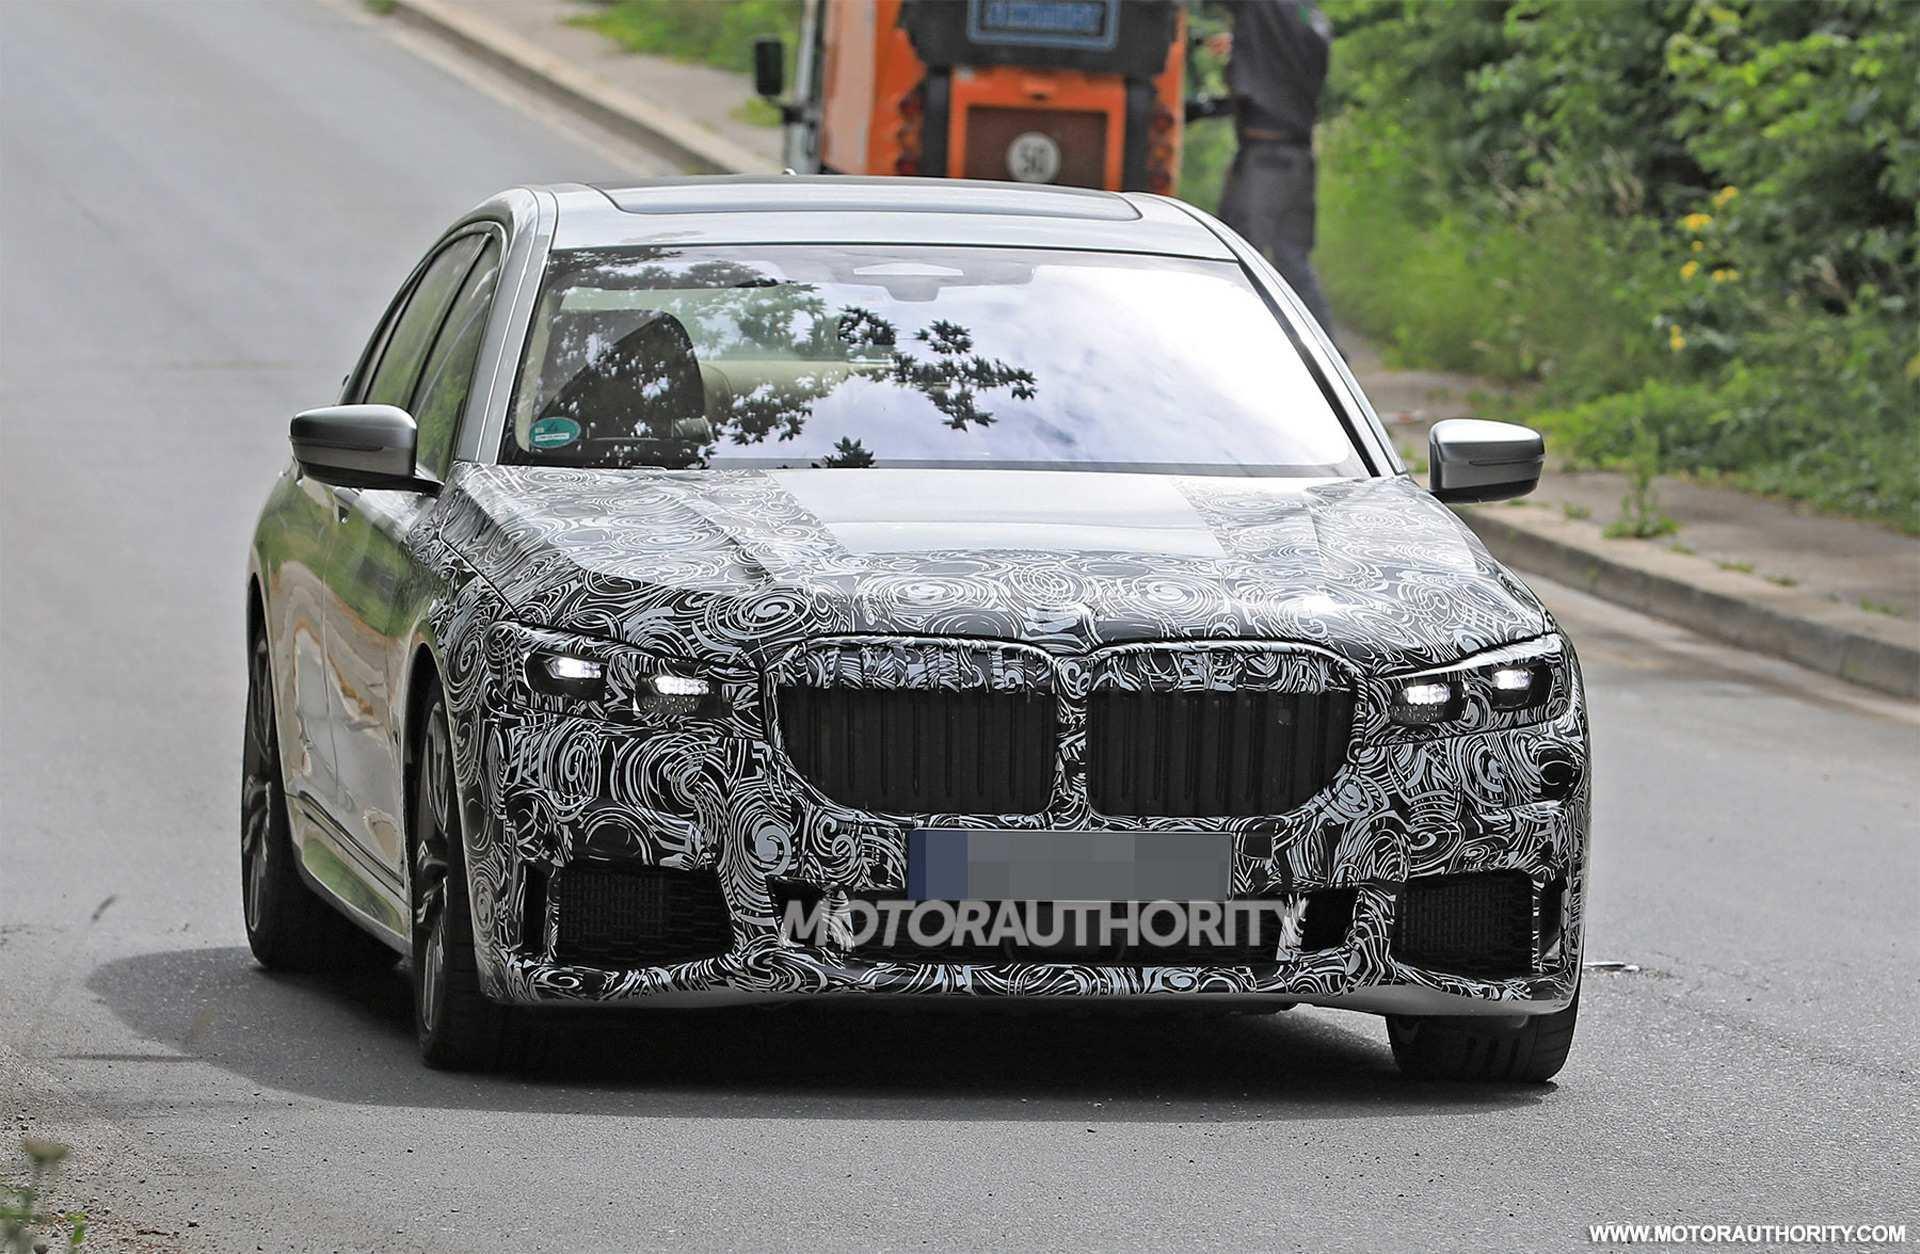 63 Best Review 2020 BMW 7 Series Lci Rumors for 2020 BMW 7 Series Lci